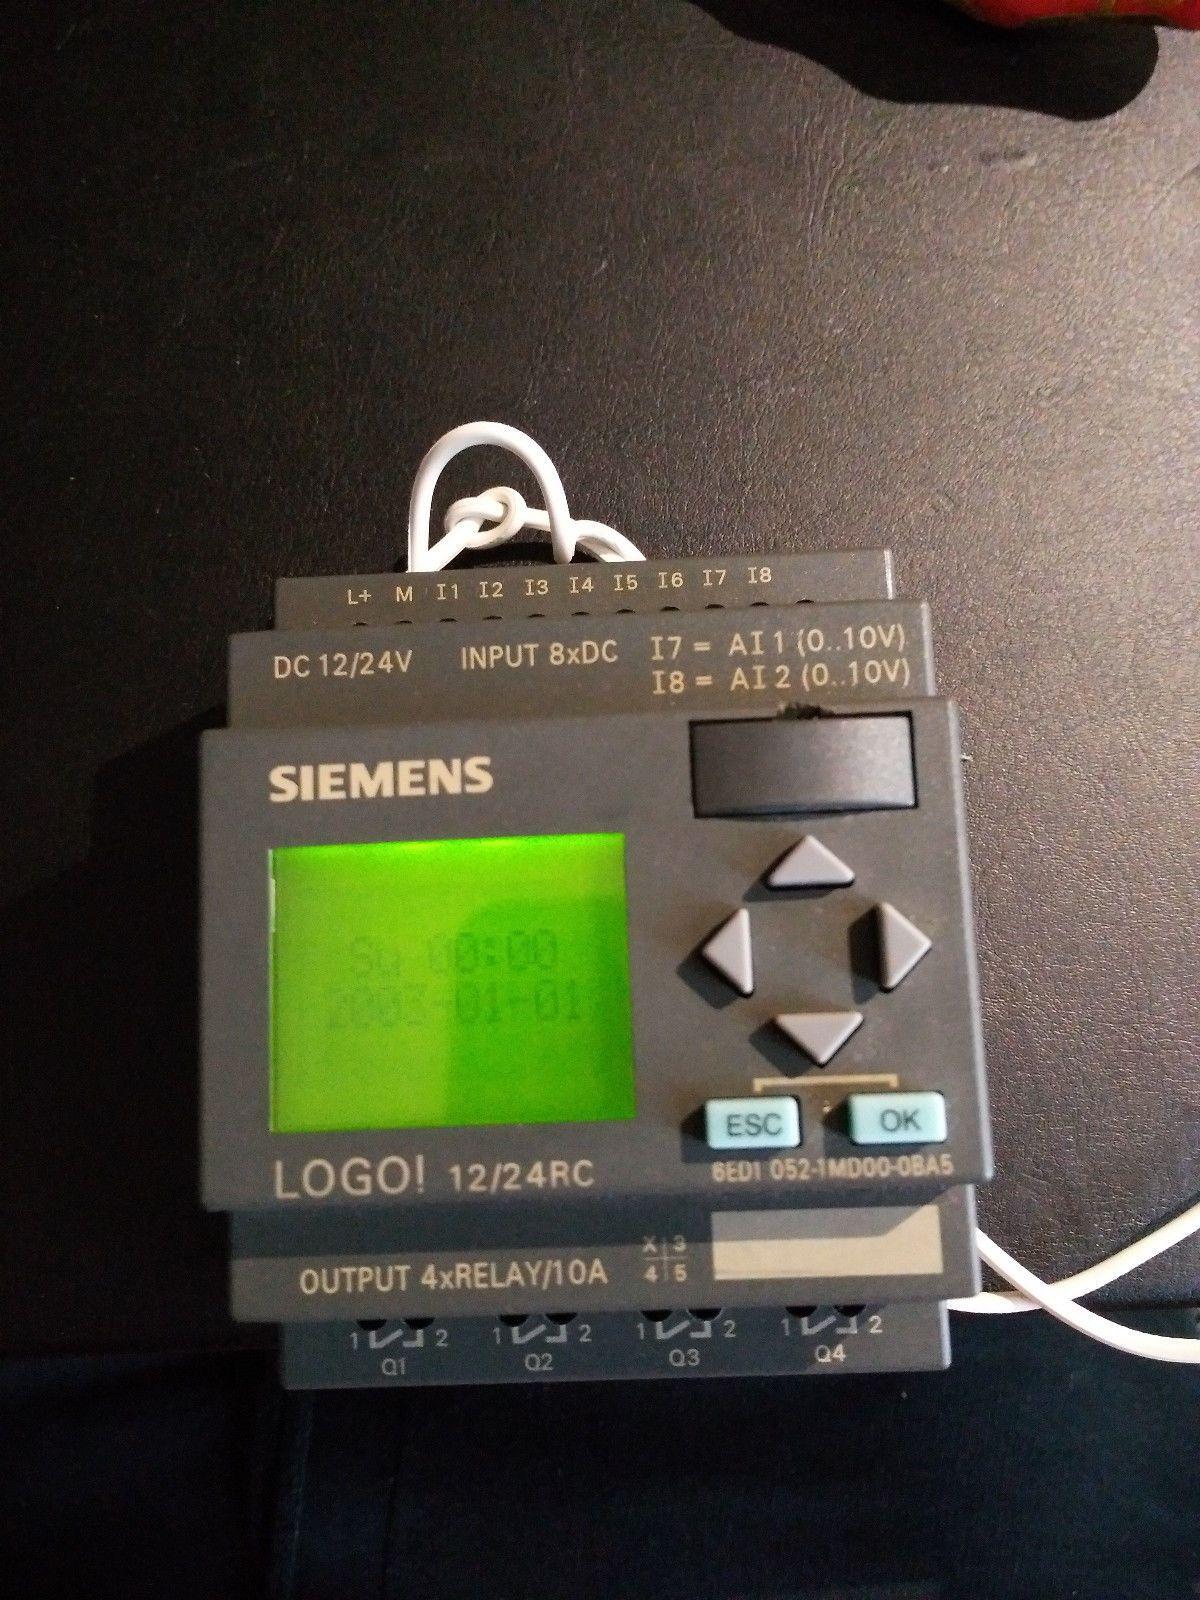 Siemens LOGO! 12/24 RC, 6ED1 0521MD000BA2 • EUR 1,50